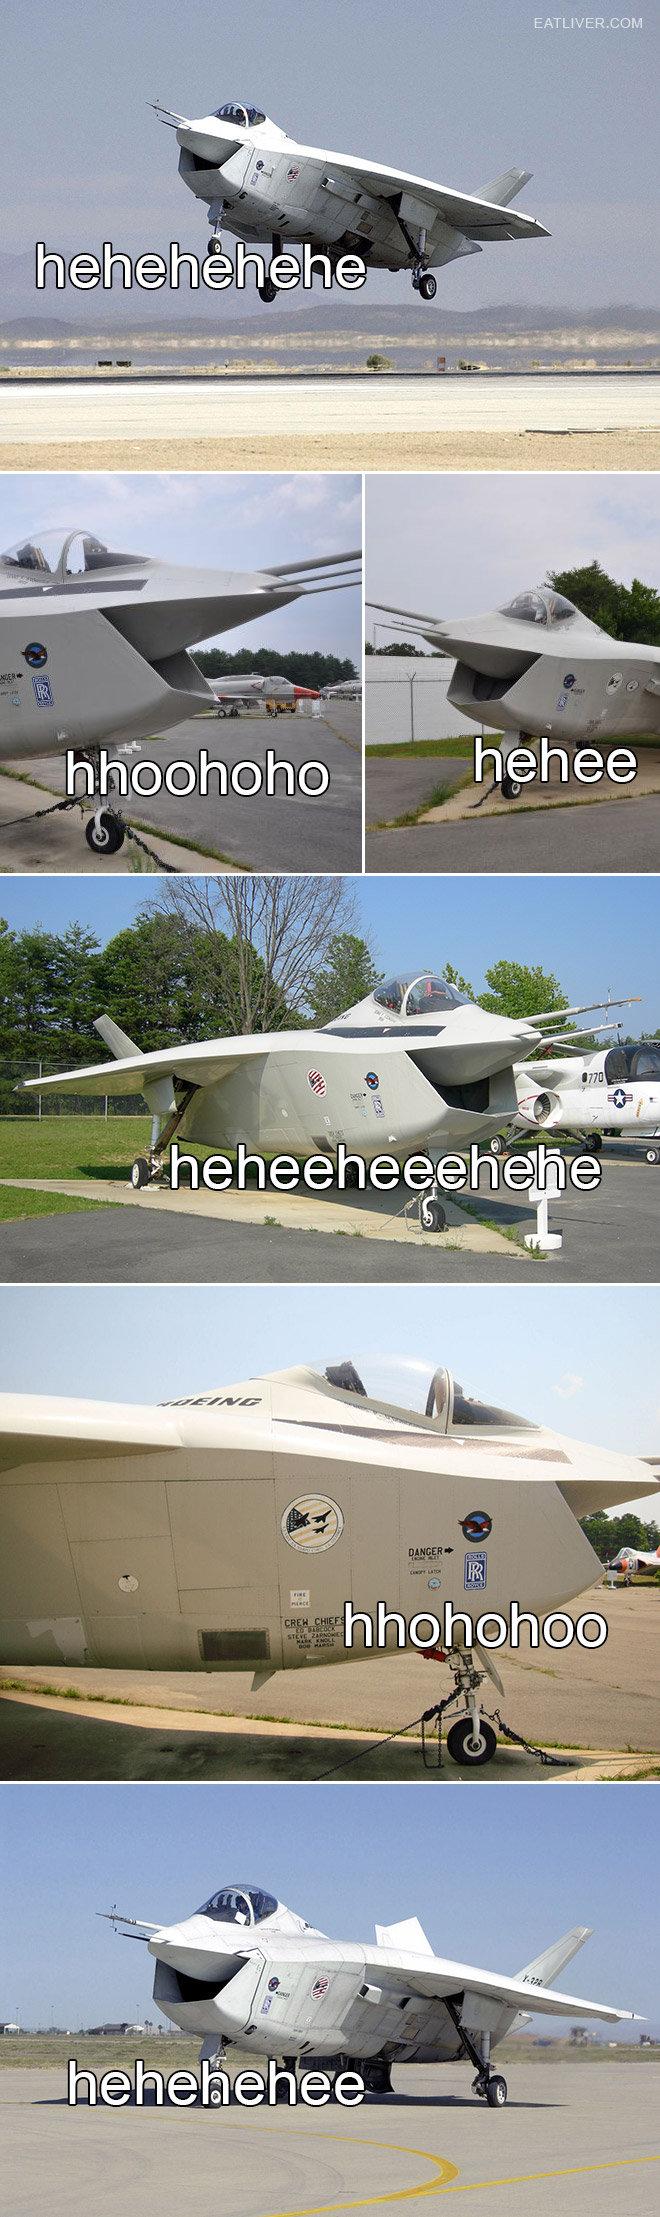 the happiest plane. . EAT LN ER. COM. 'Bombing sand sure is fun' plane happy tagsarefun